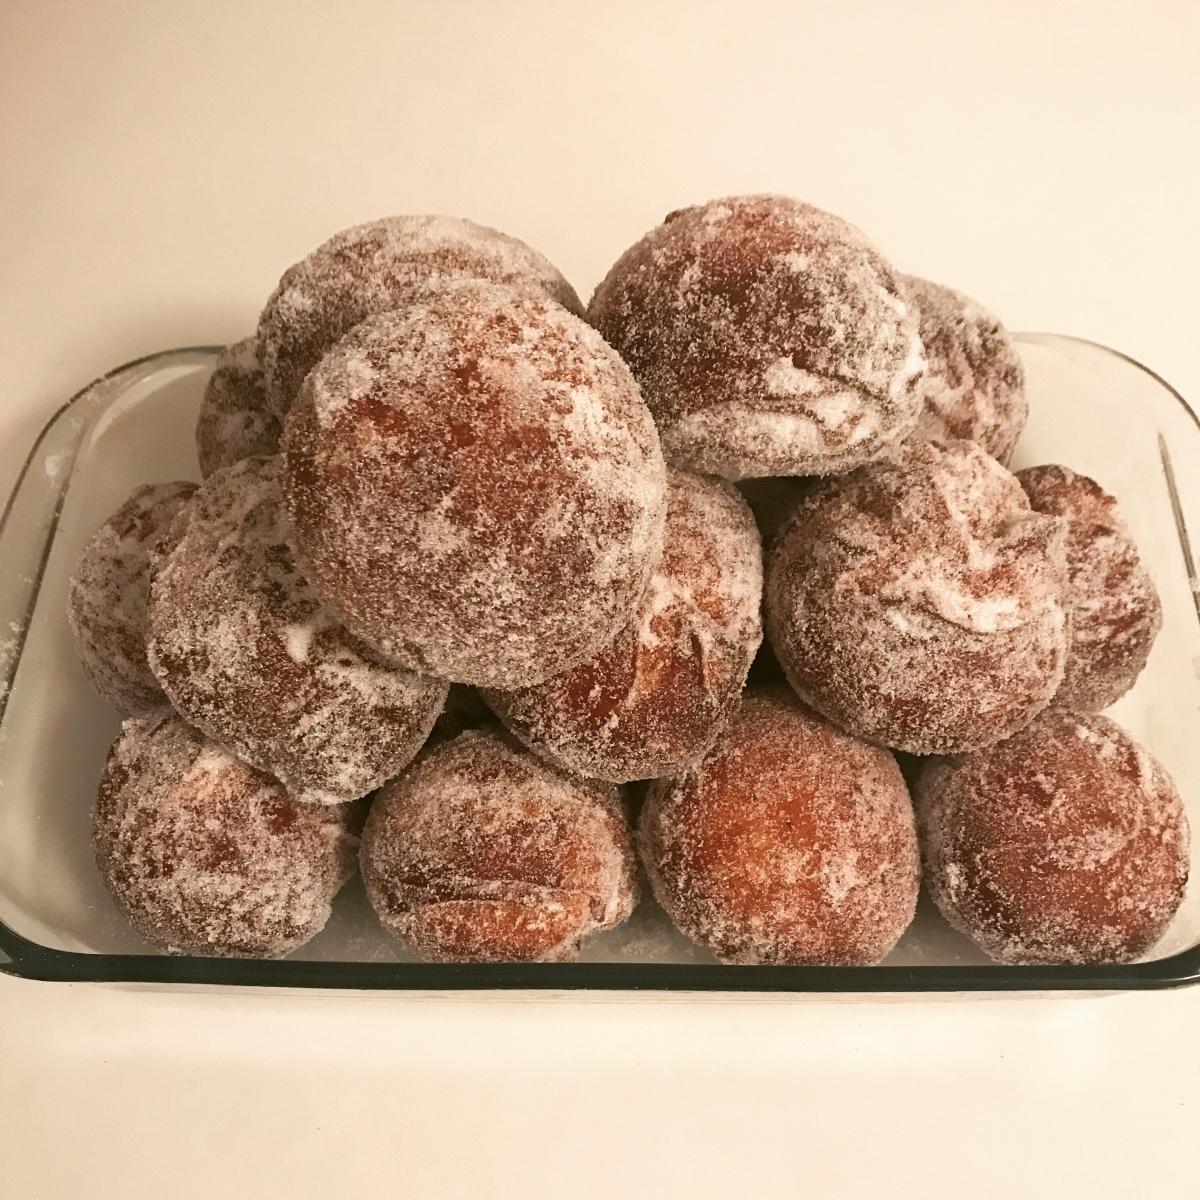 Munkit (doughnuts)